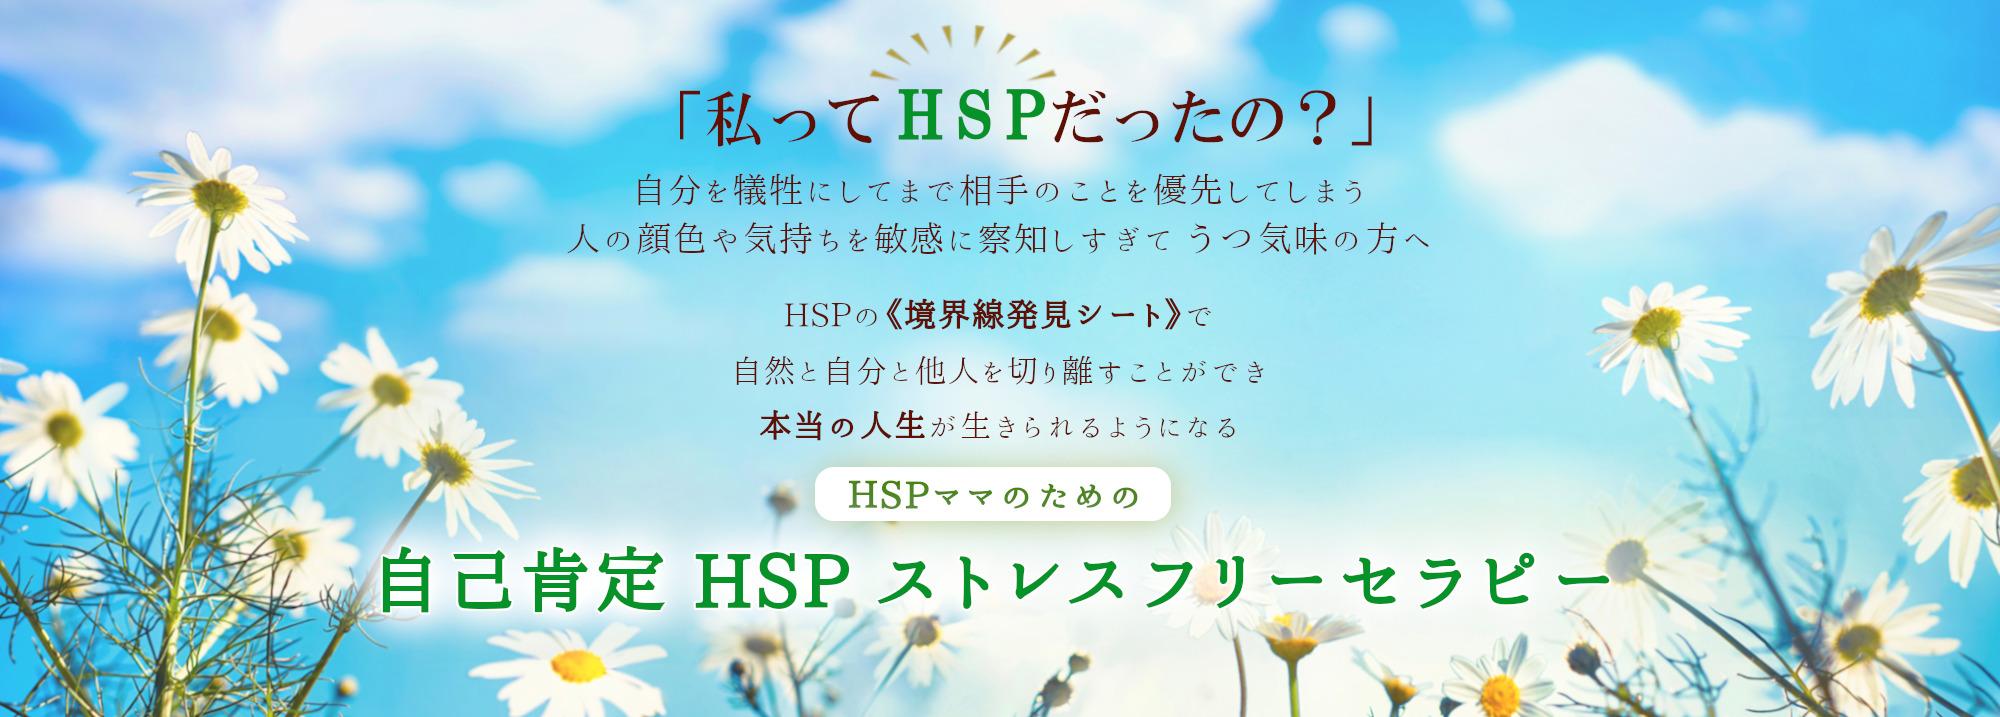 HSP ストレス 自己肯定感